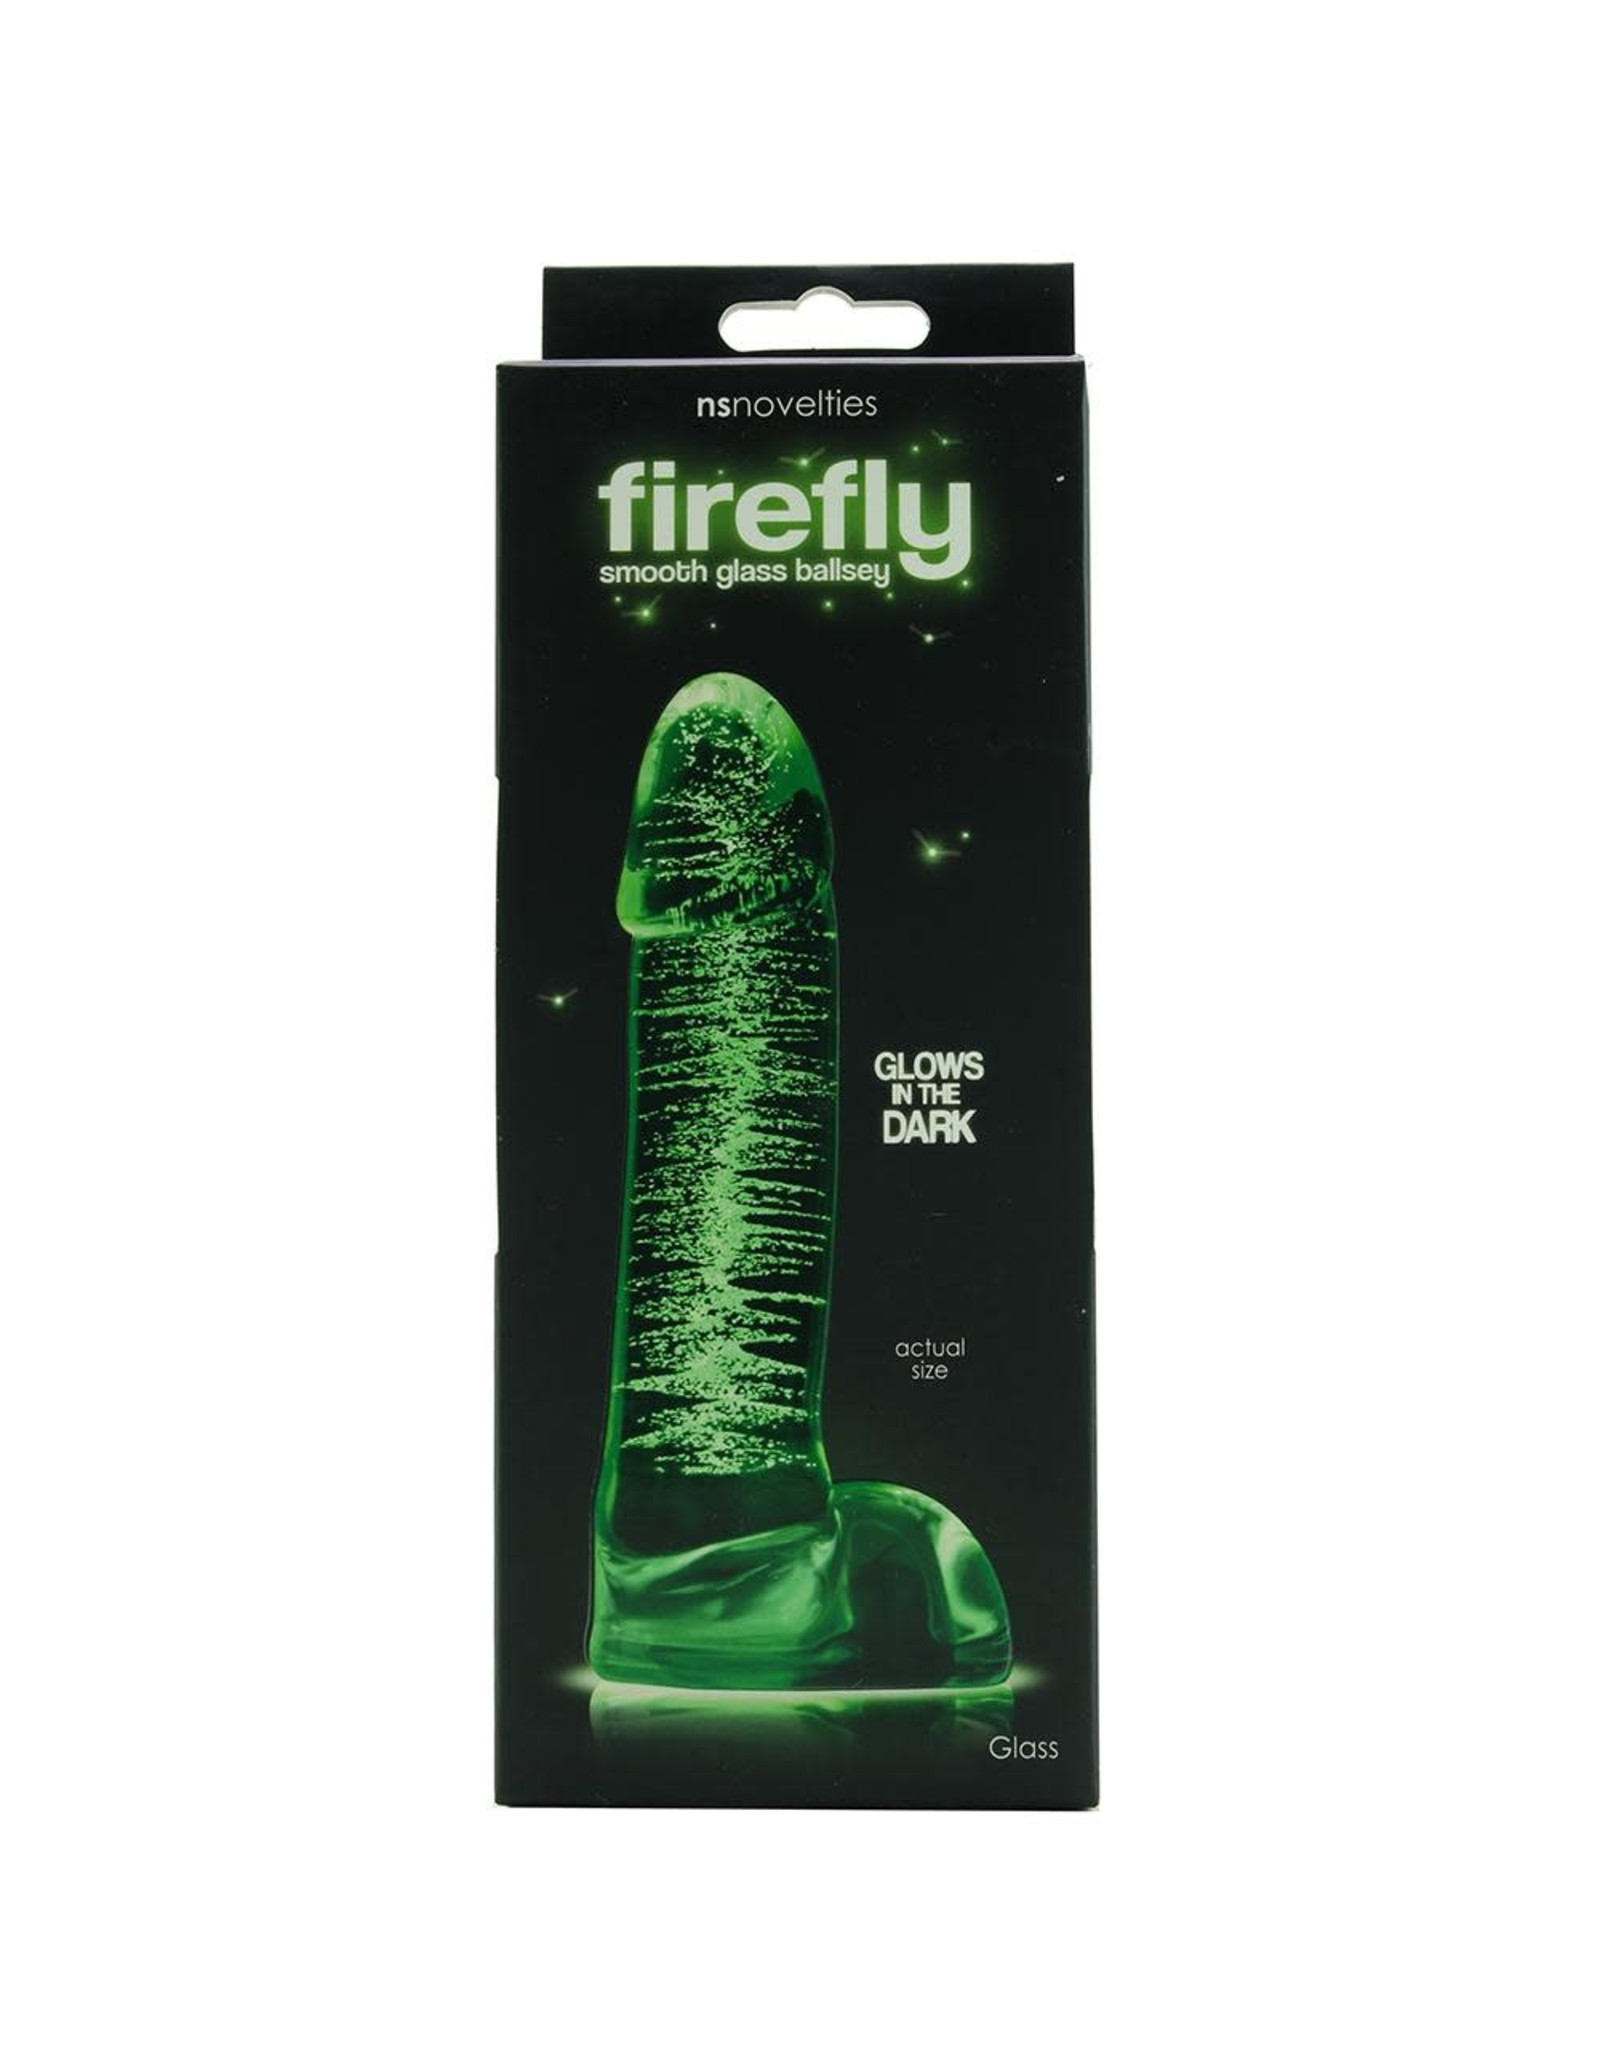 NSN FIREFLY - GLOW IN THE DARK GLASS - BALLSY DILDO